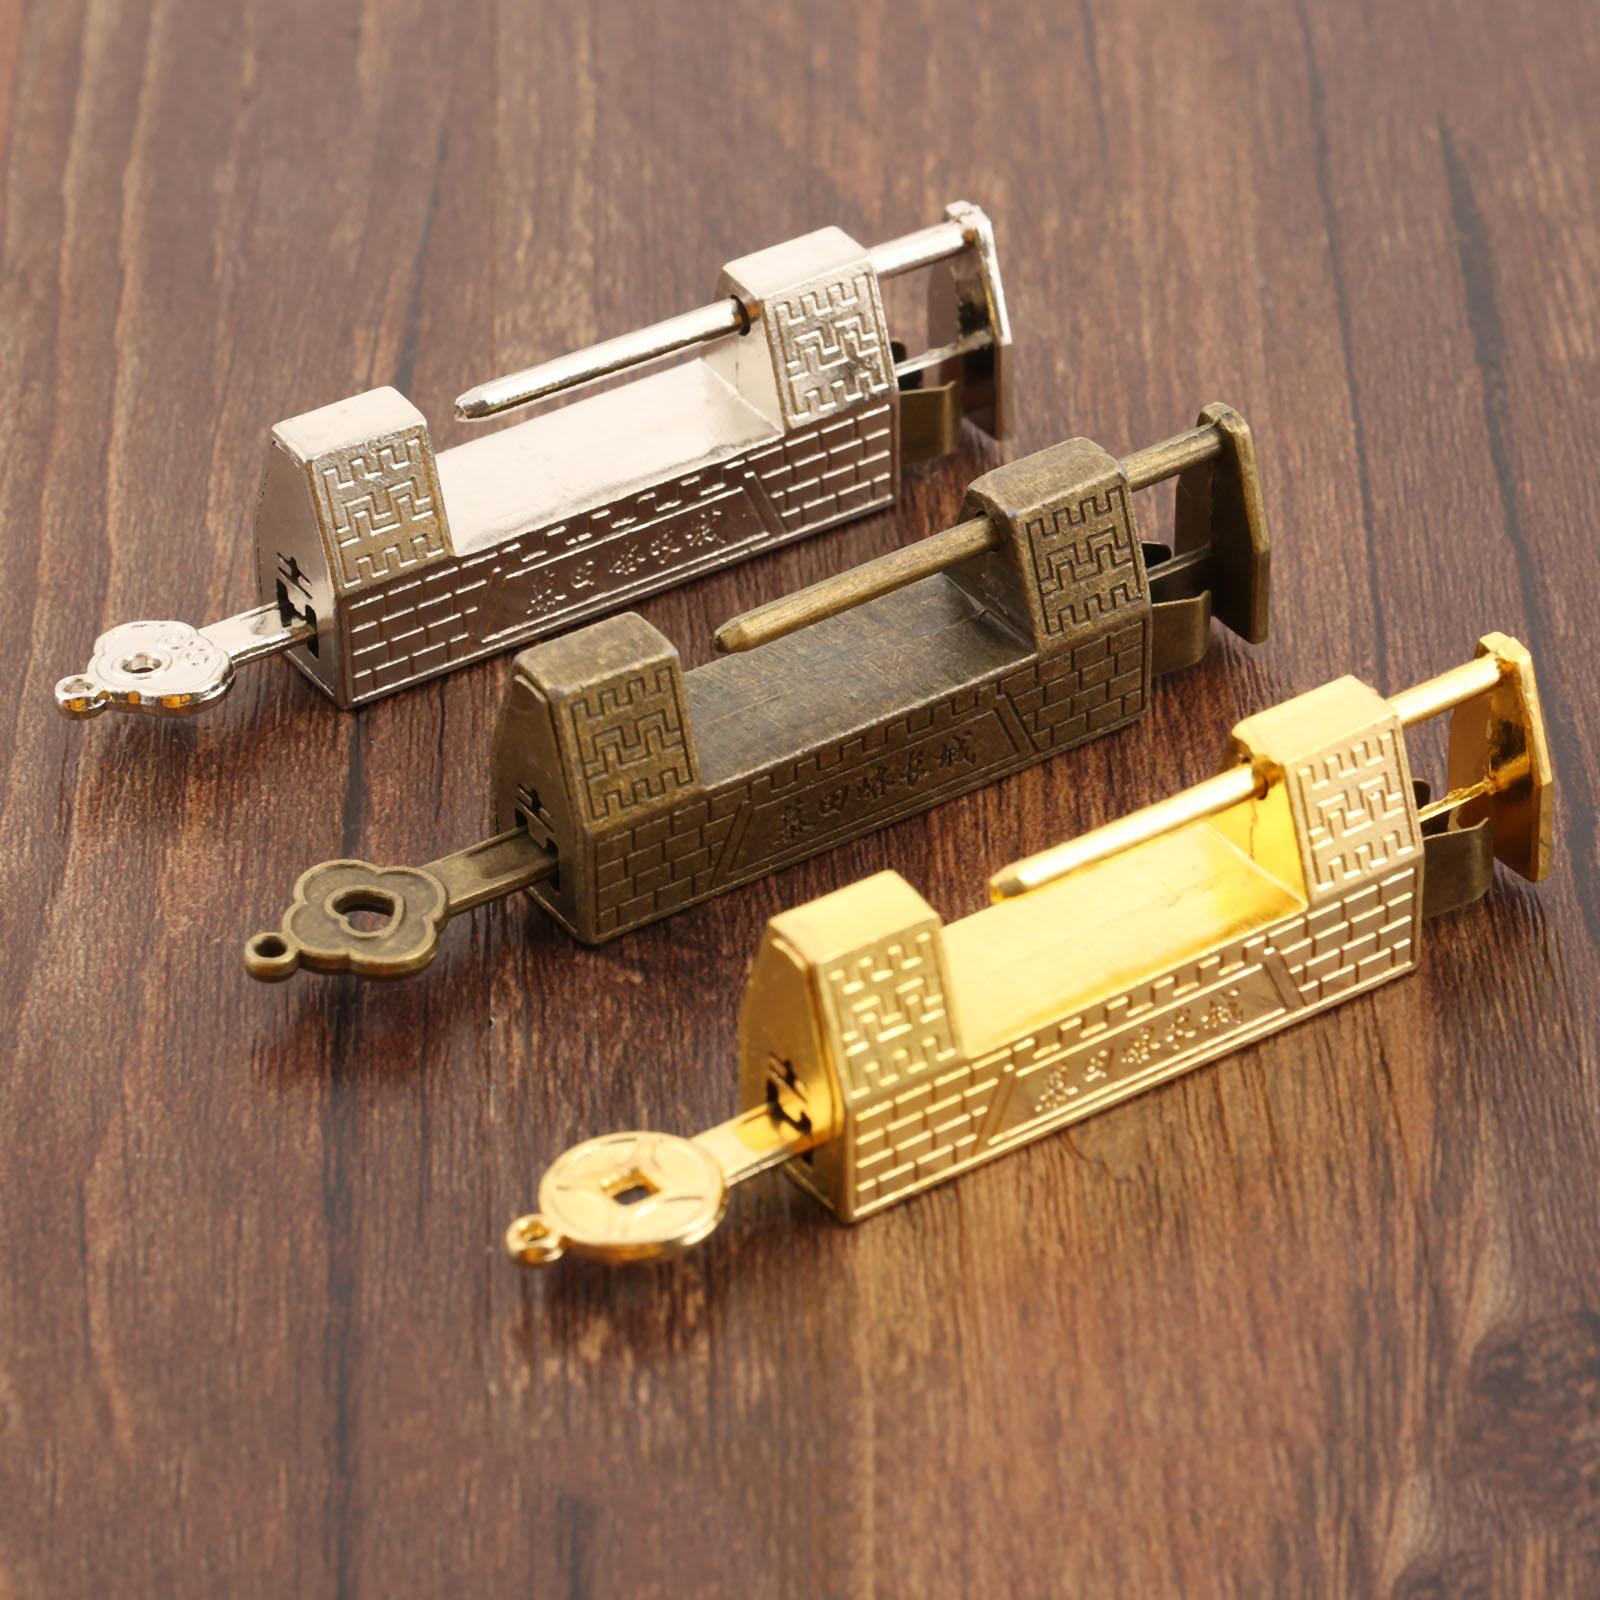 DRELD Vintage Old Lock Retro Great Wall Padlock Jewelry Wooden Box Padlock Lock for Suitcase Drawer Cabinet Door Hardware Locks